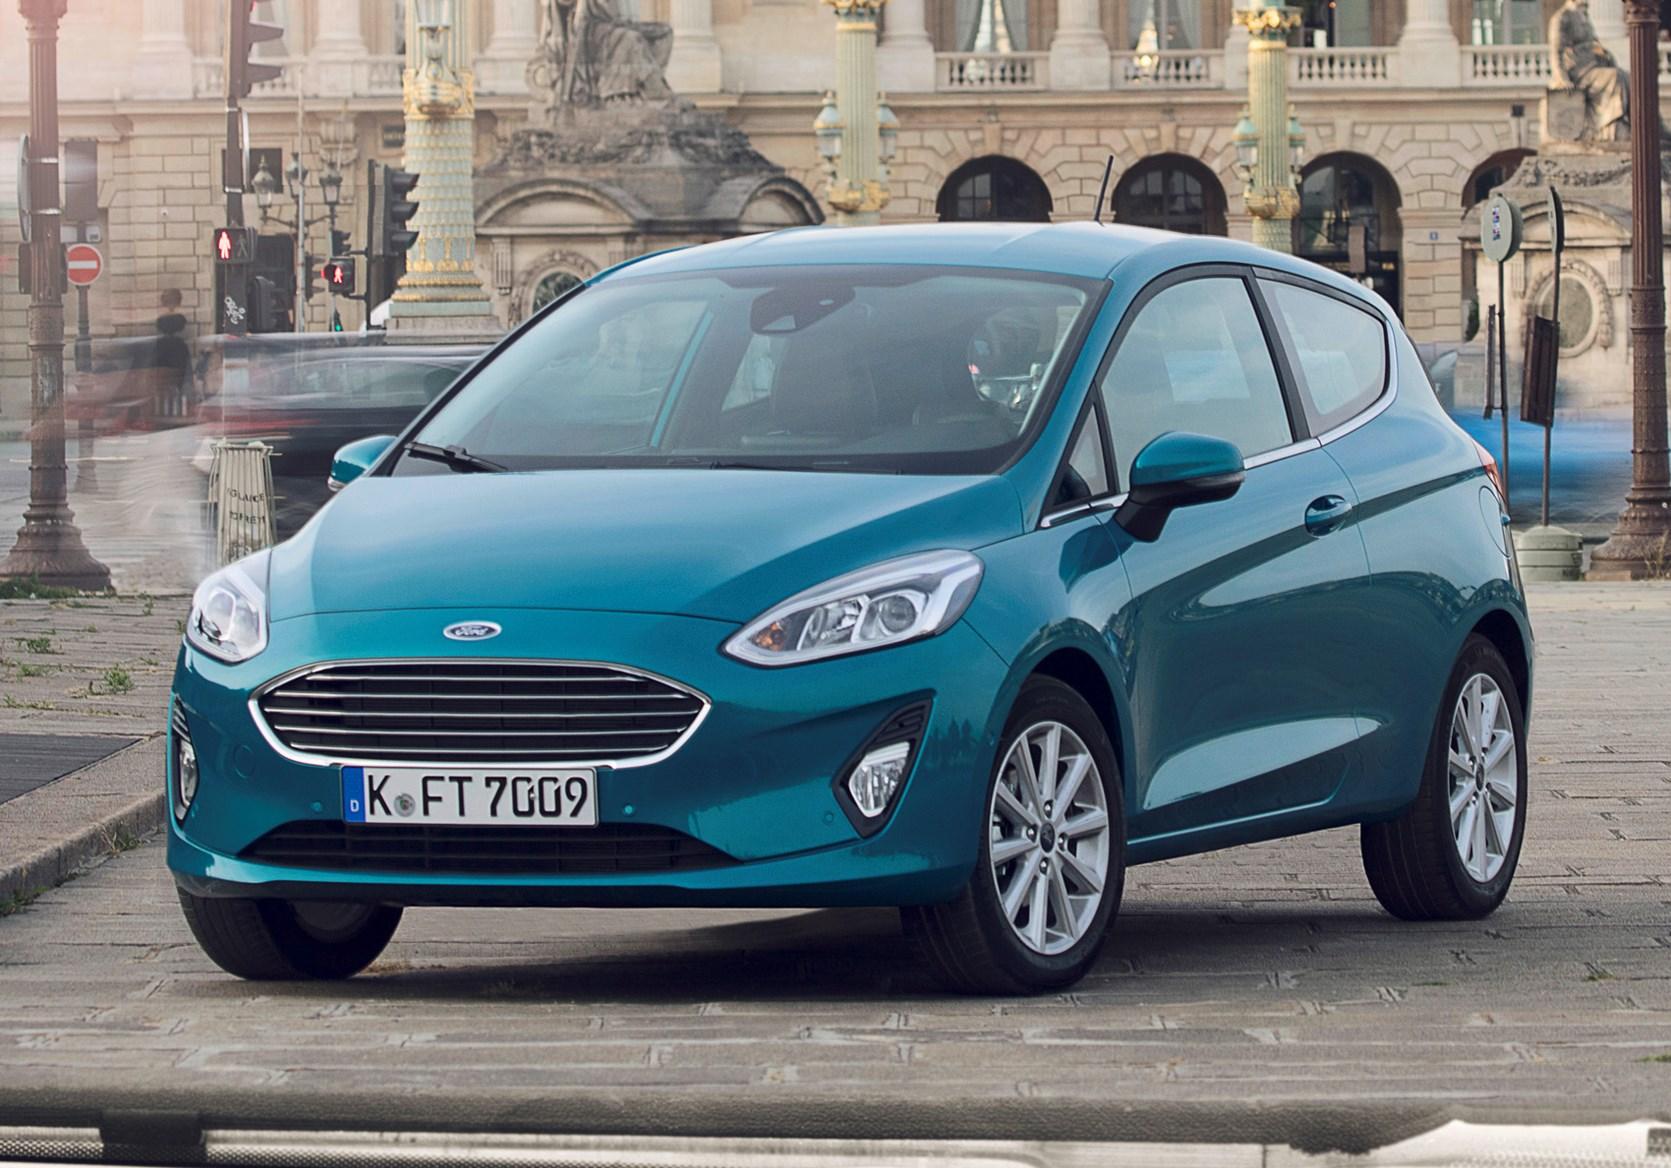 Car Finance Offers  Car Finance Explained  Citroën UK